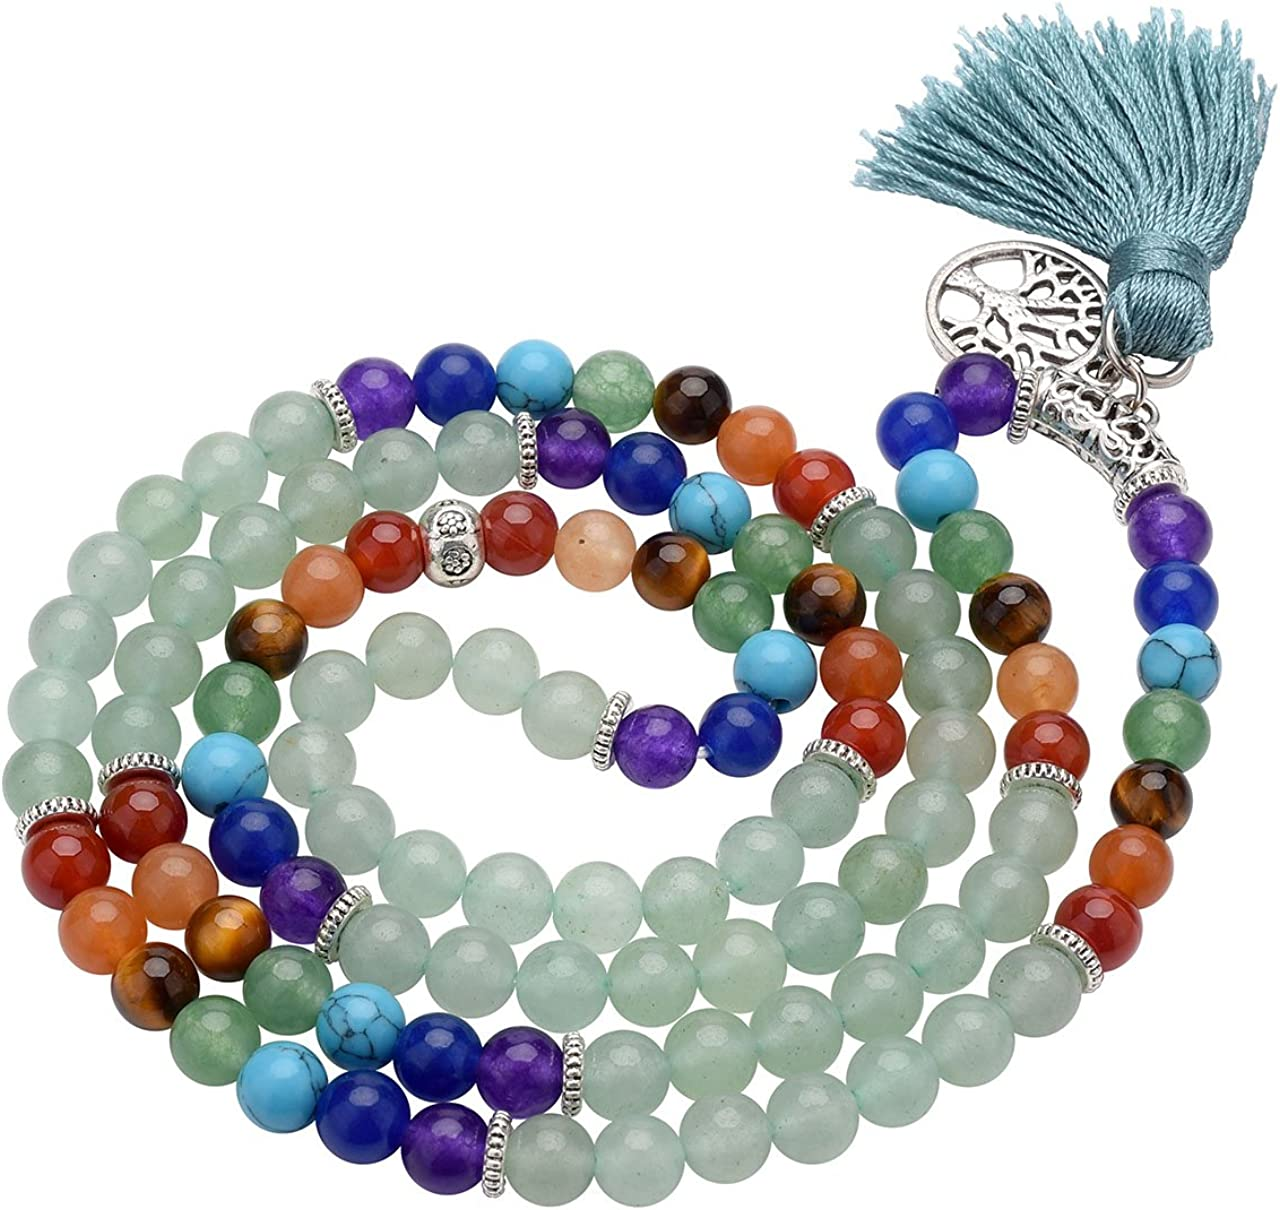 Top Plaza 7 Chakra Mala Prayer Beads 108 Meditation Healing Multilayer Bracelet//Necklace W//Tree of Life Tassel Charm